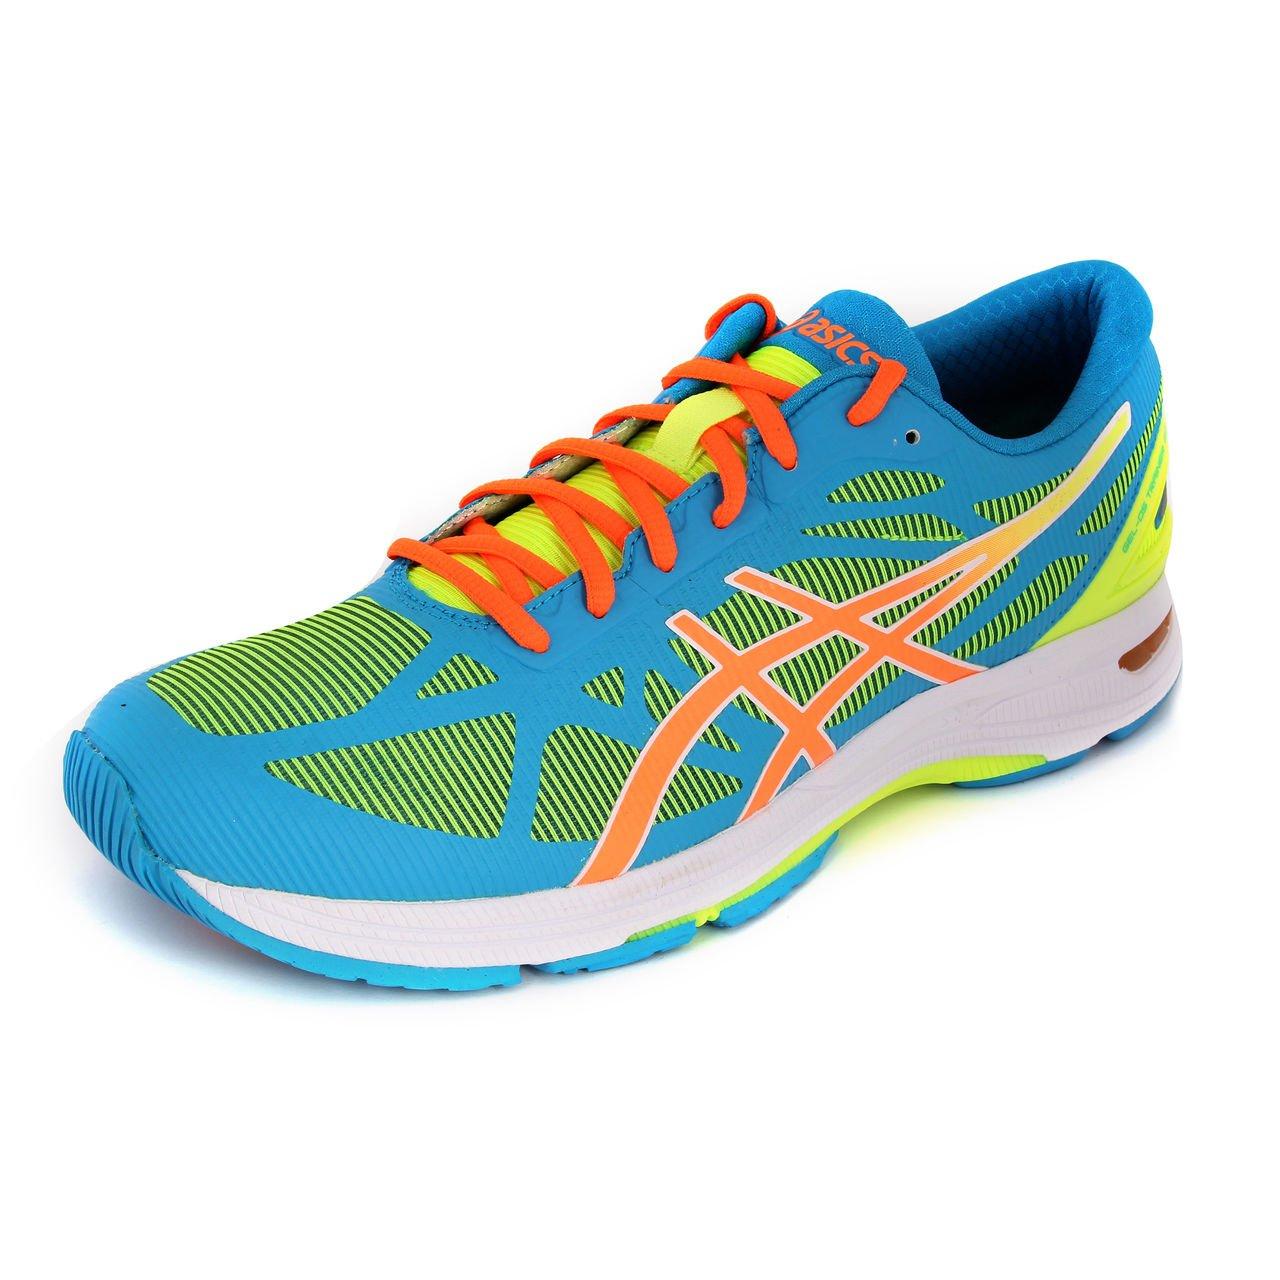 the best attitude 9ff33 6c51f ASICS Men's Gel-Ds Trainer 20 Flash Yellow, Hot Orange and ...